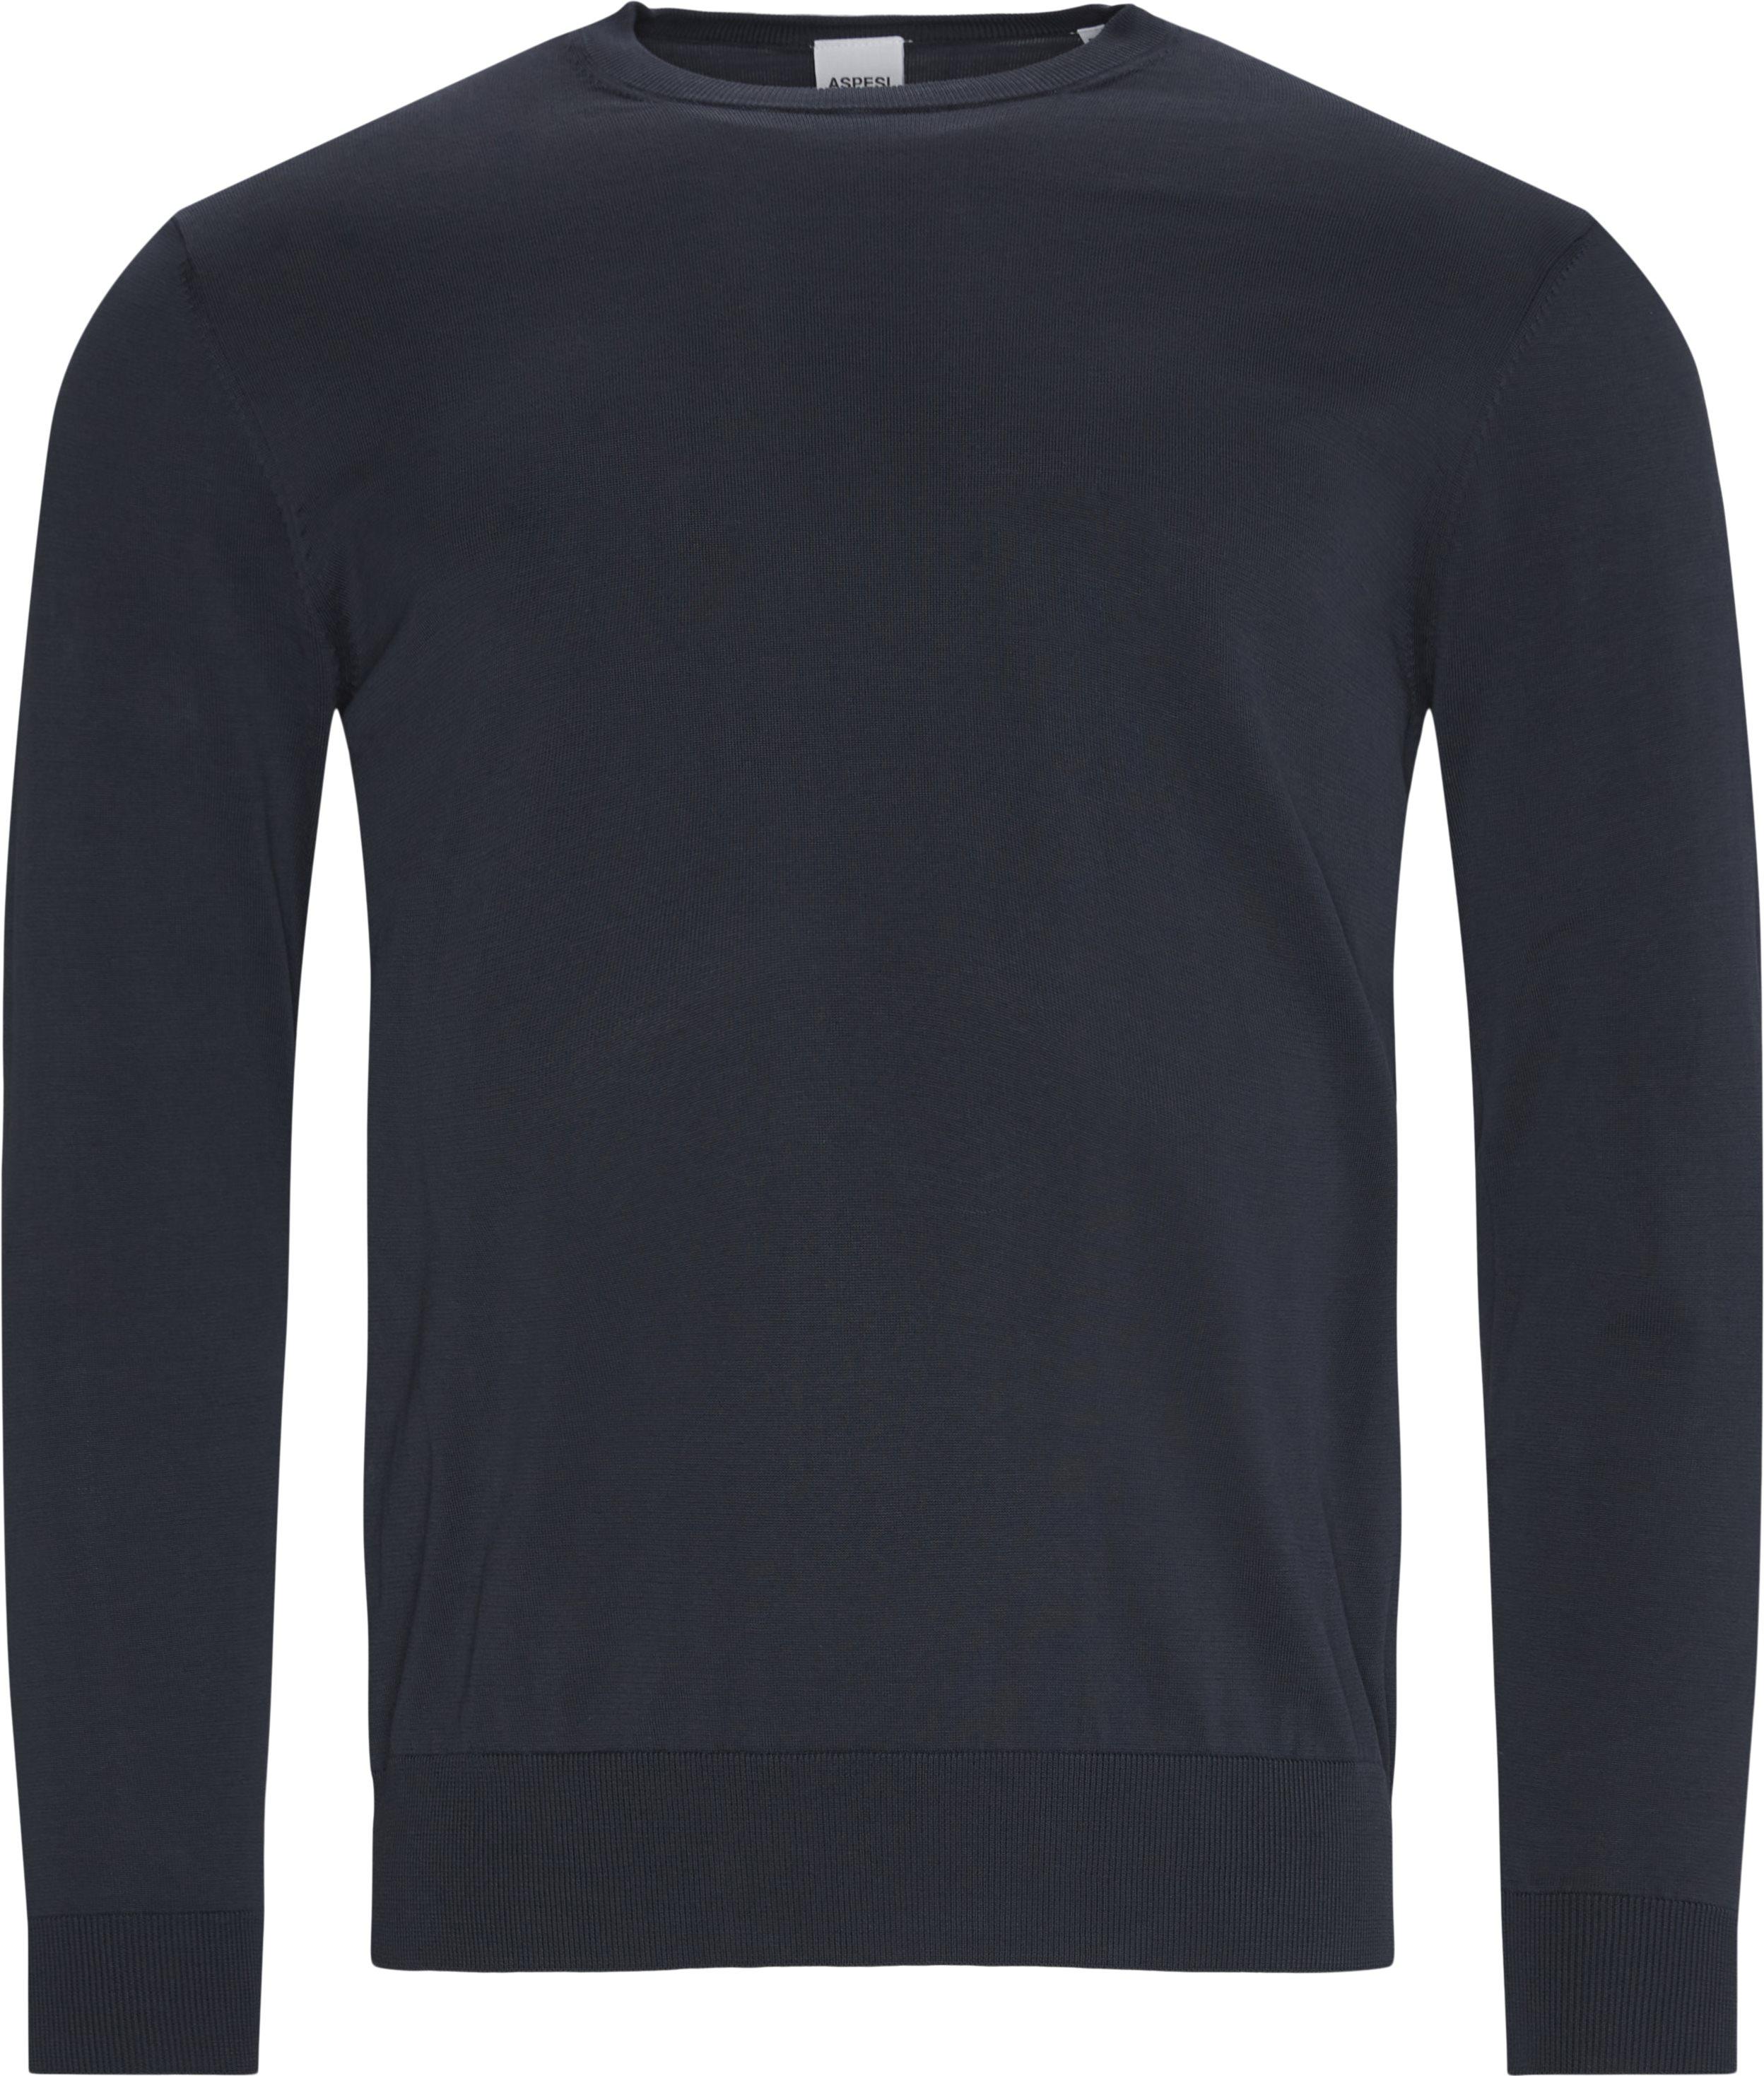 Crewneck strik - Strik - Regular fit - Blå